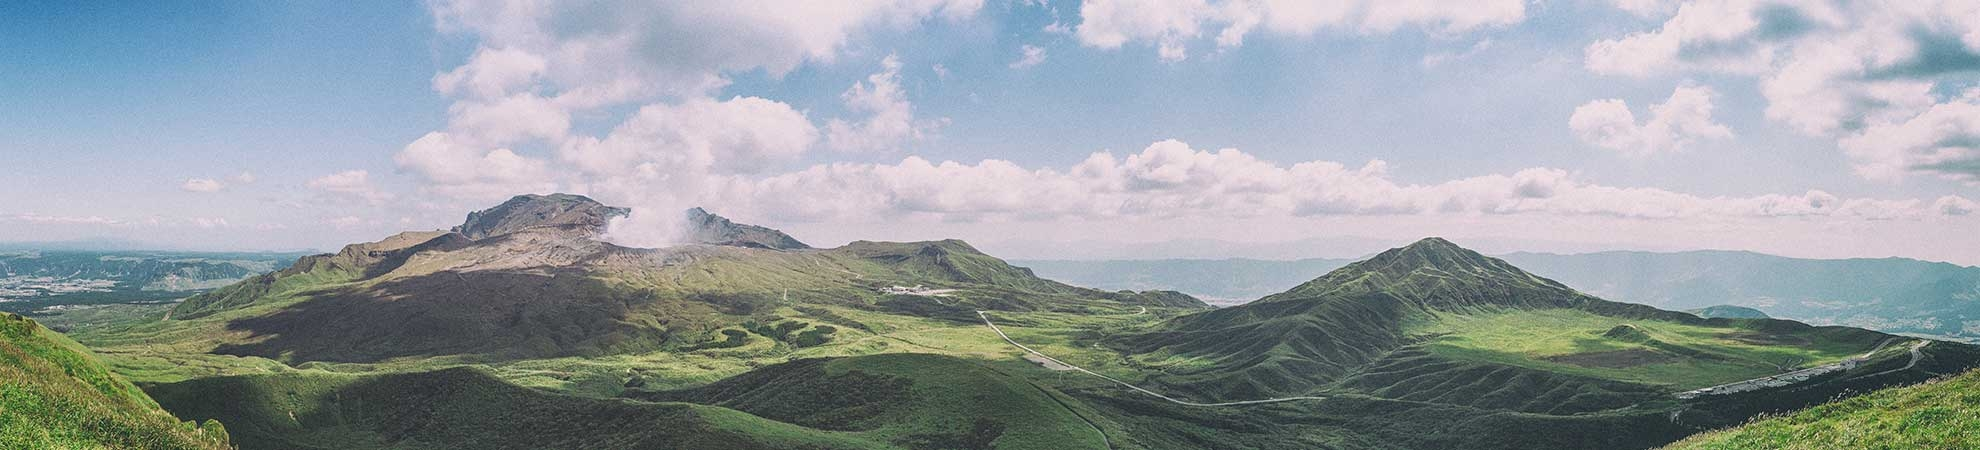 Voyage Mont Aso